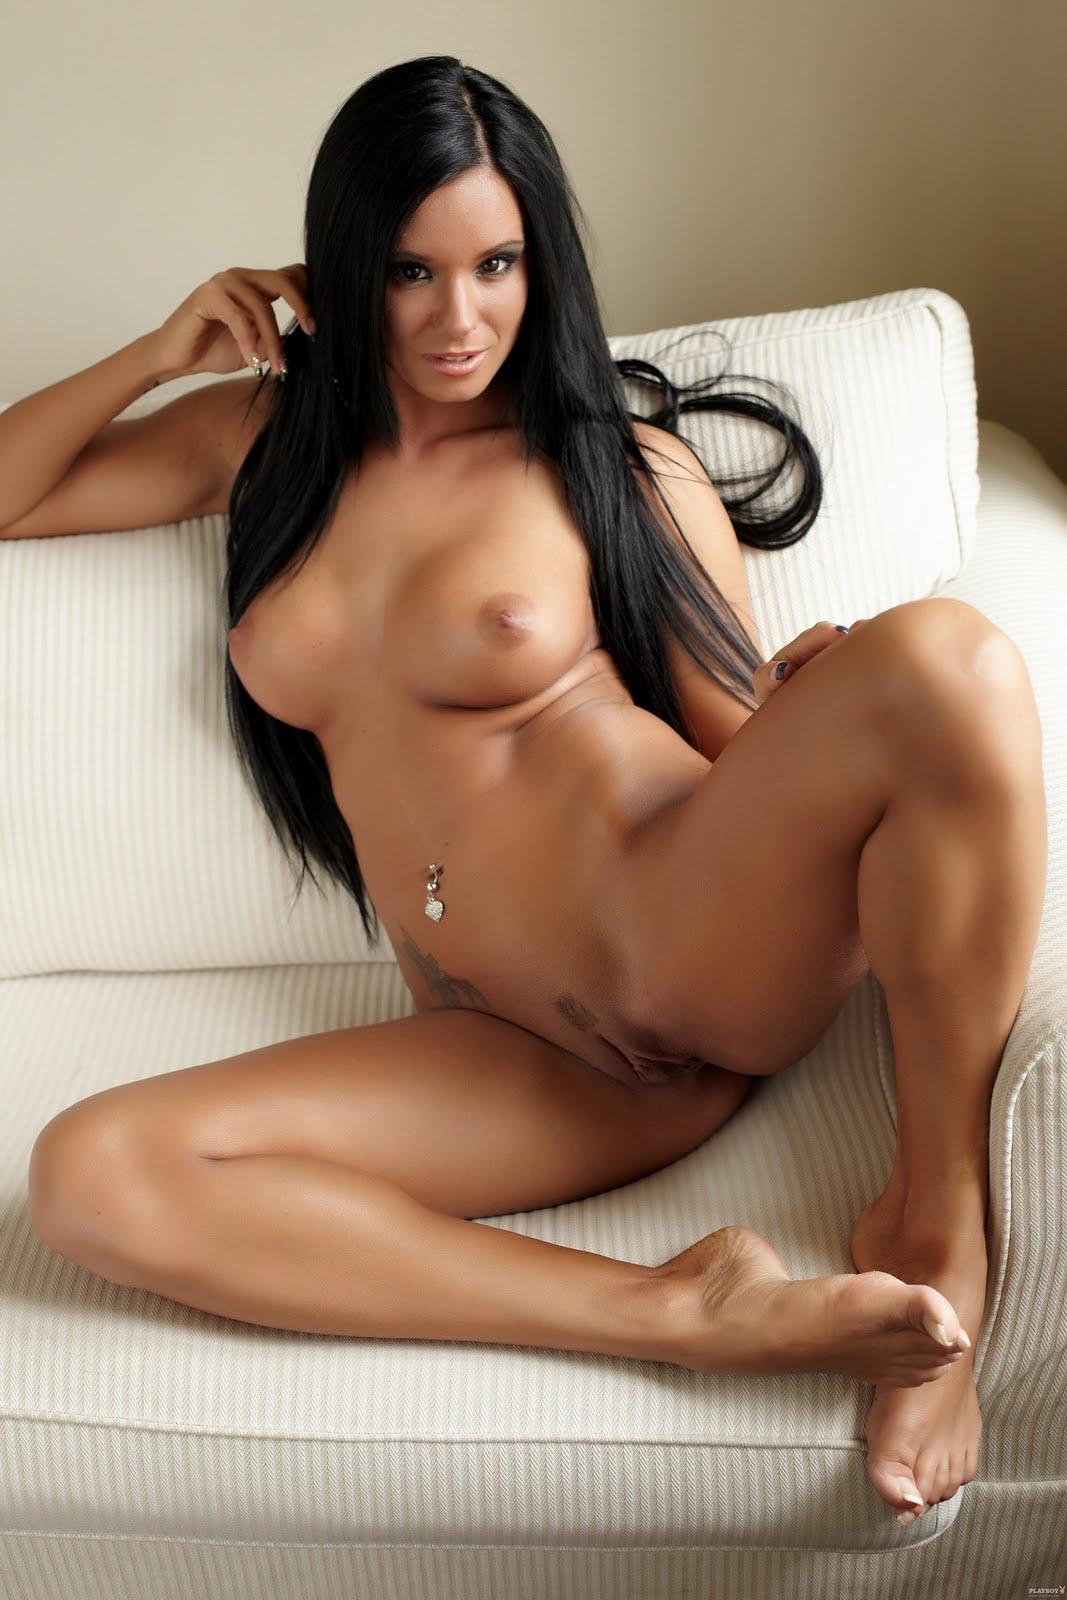 Ashley Bulgari Nude Porn sexy top celebrity photos: ashley bulgari nude